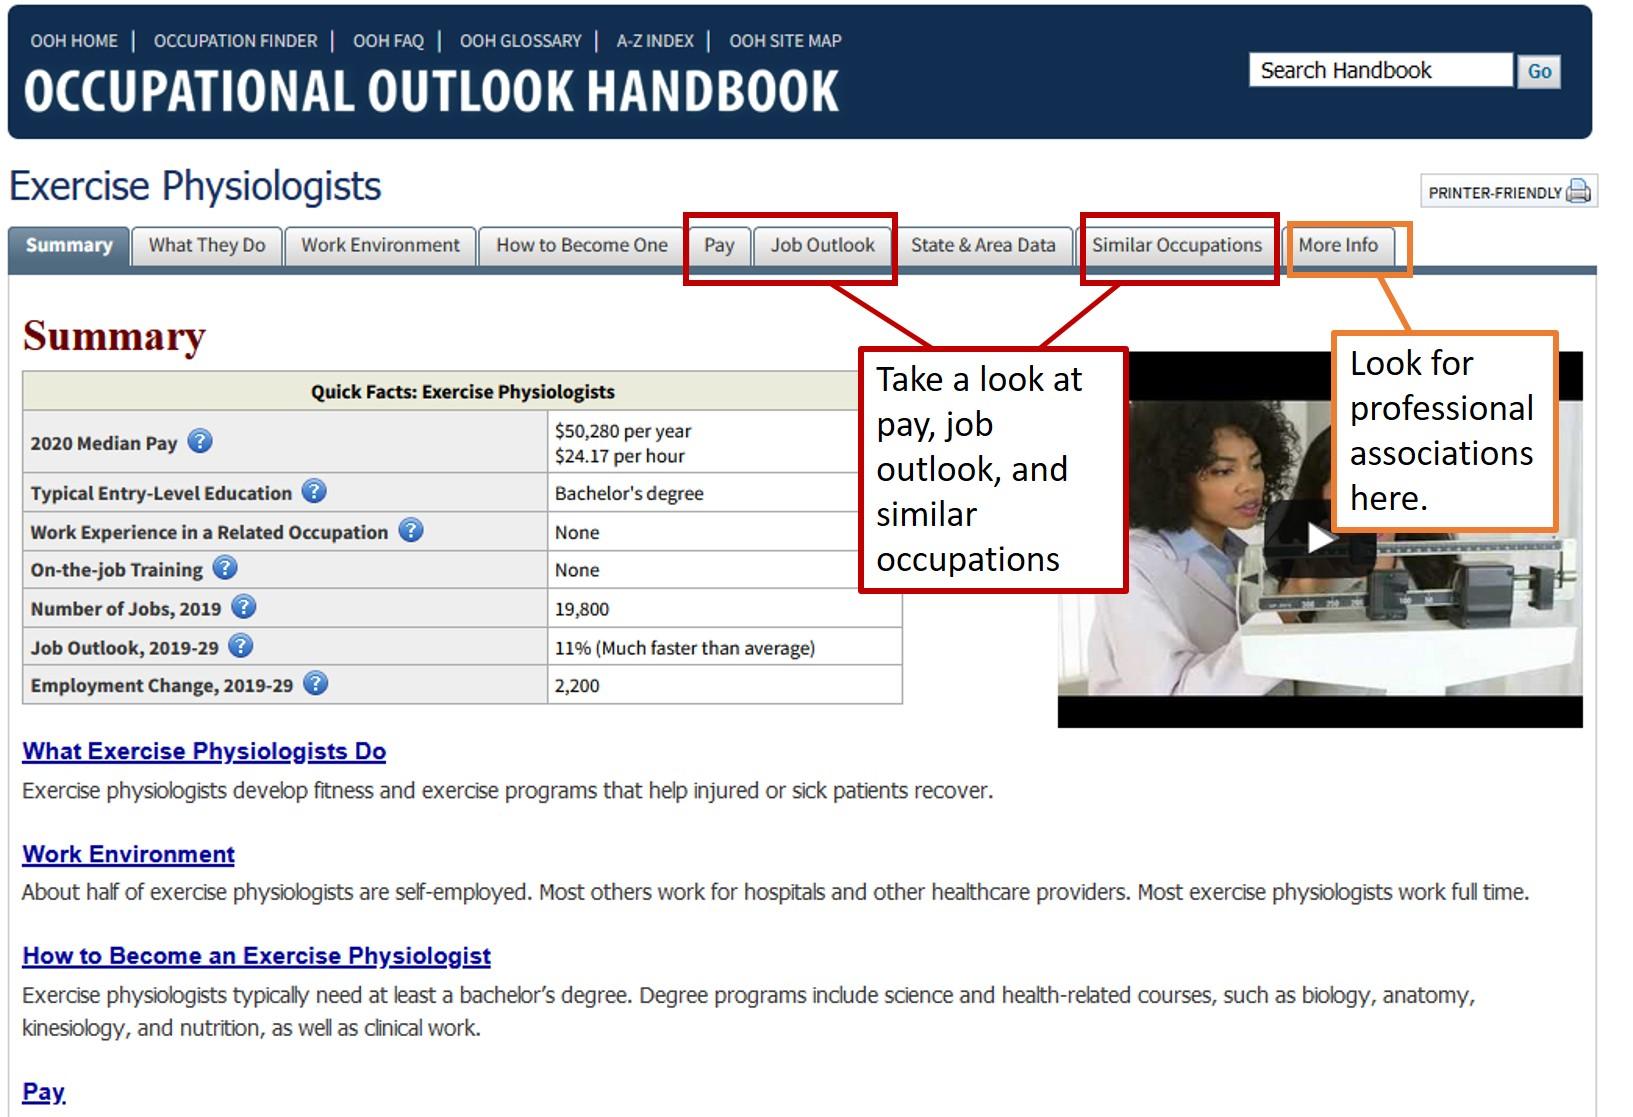 OOH-Occupational Outlook Handbook